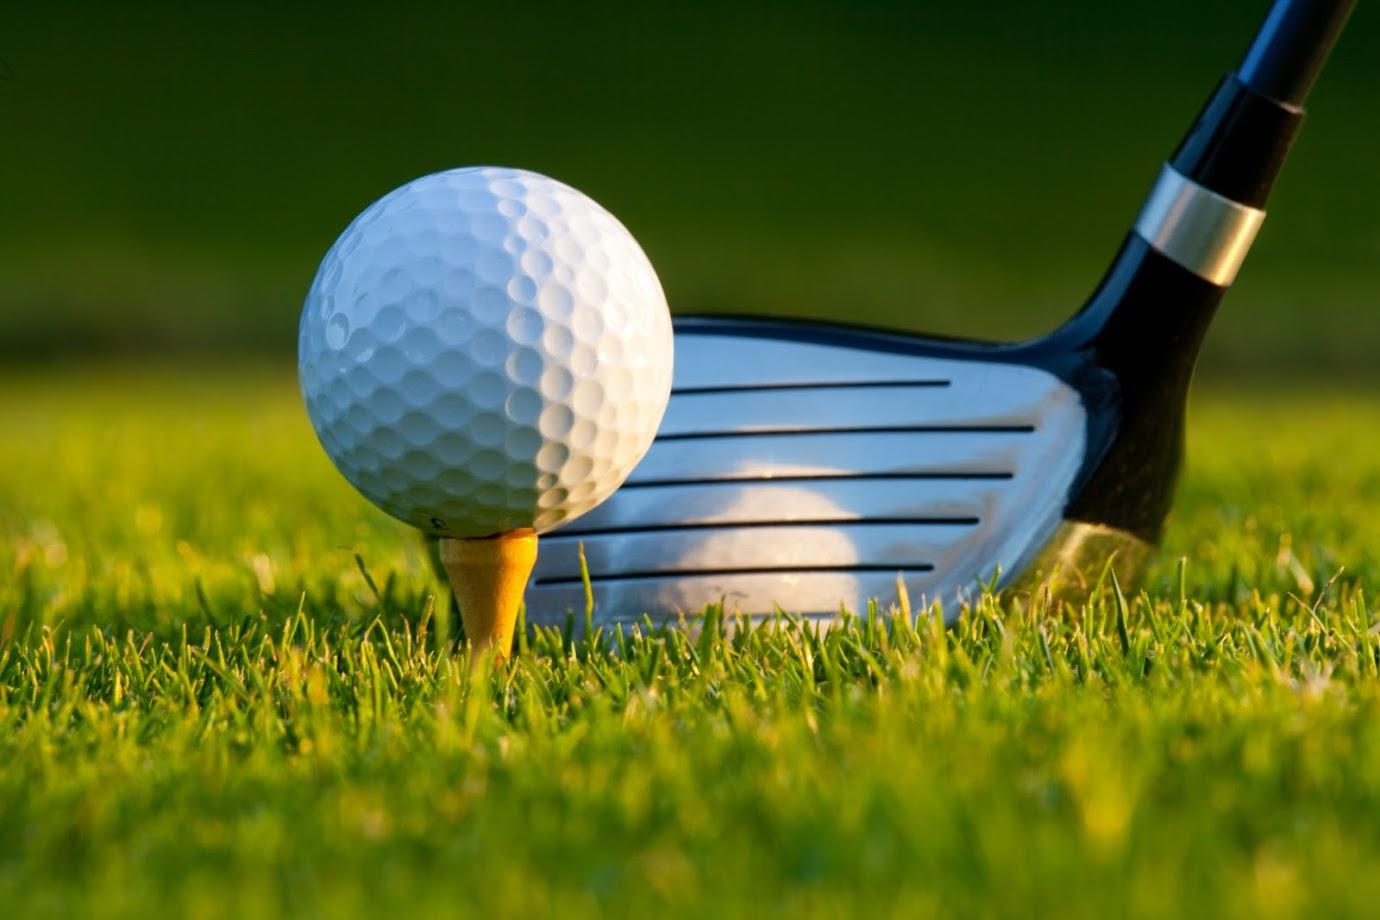 5 Practical Reasons to Add a Backyard Putting Green - image golfing on https://www.sunburstlandscaping.com